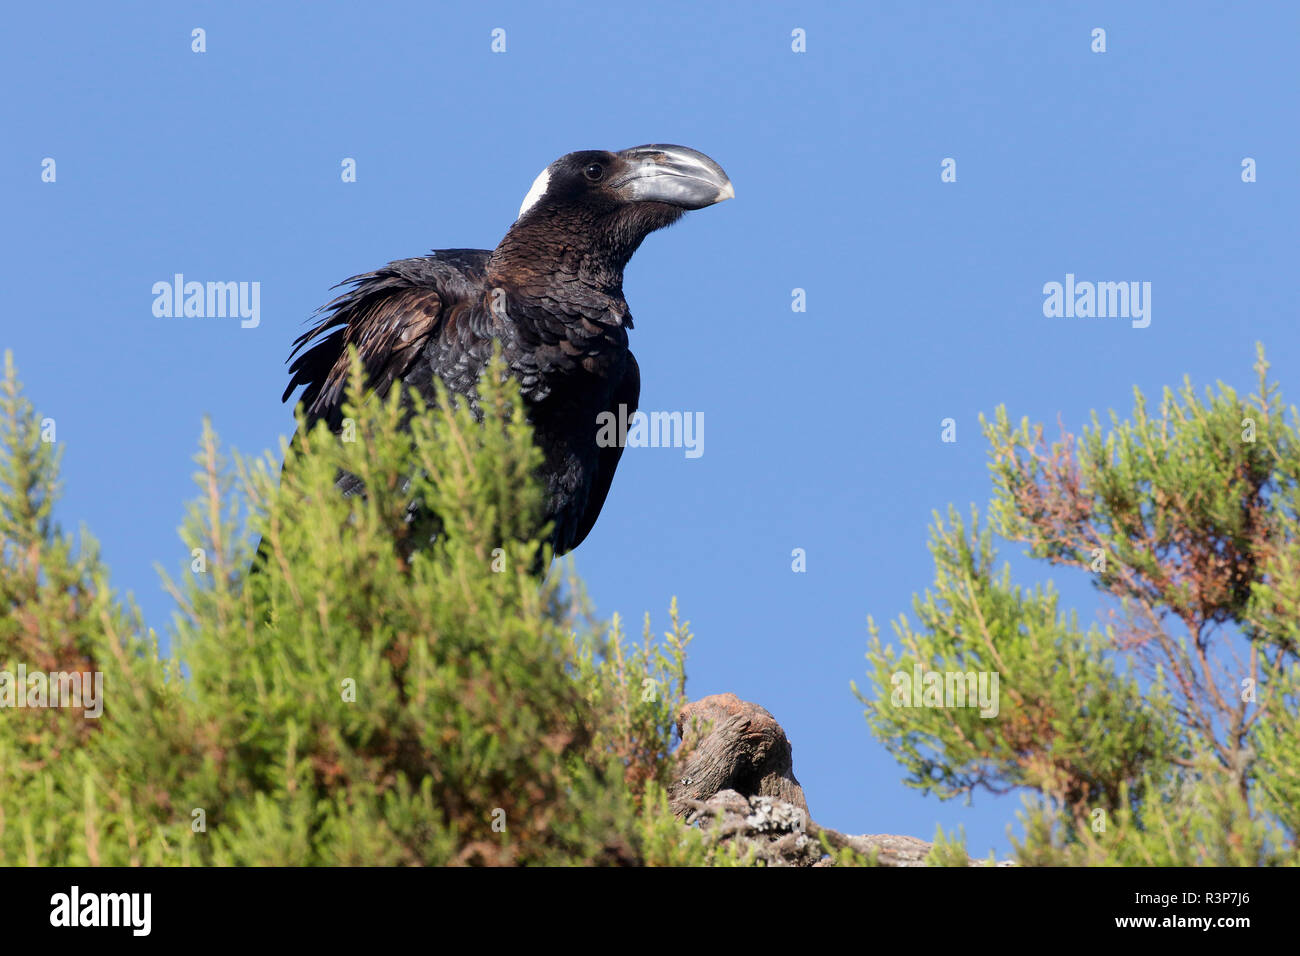 Thick-billed Raven (Corvus crassirostris) on Giant Heather, Simien National Park, Ethiopia - Stock Image